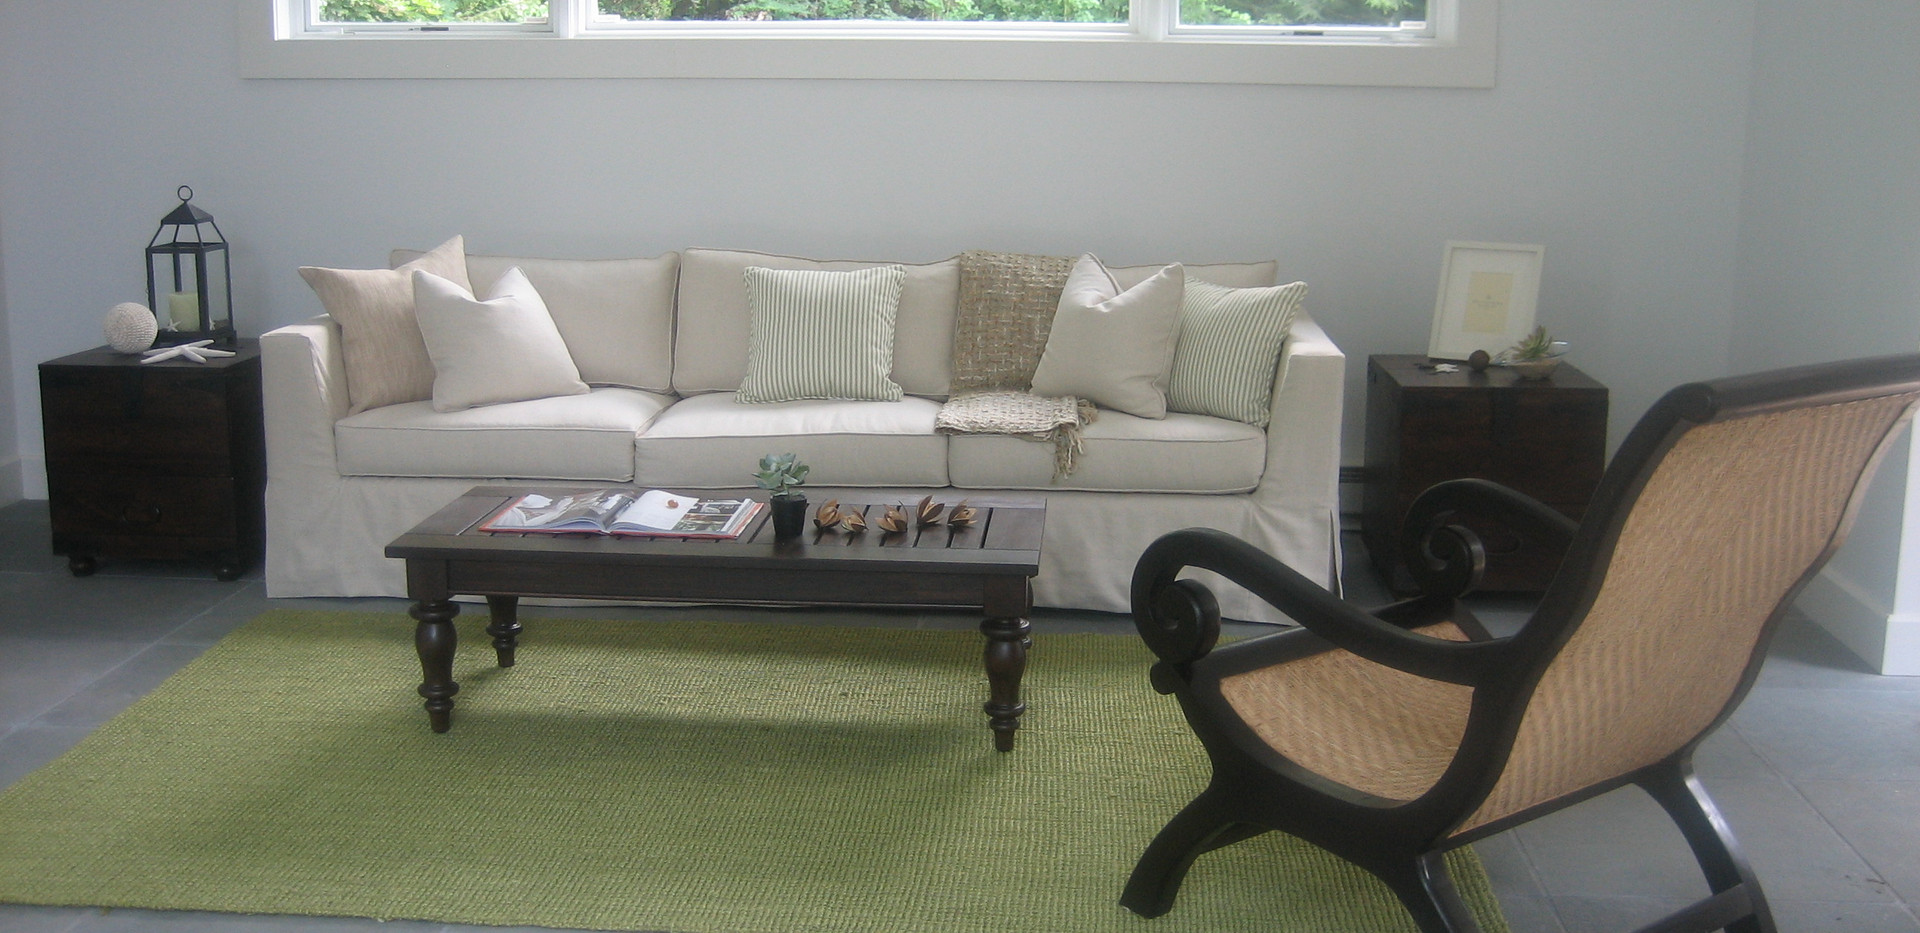 poolhouse sofa shot with plant chair aga